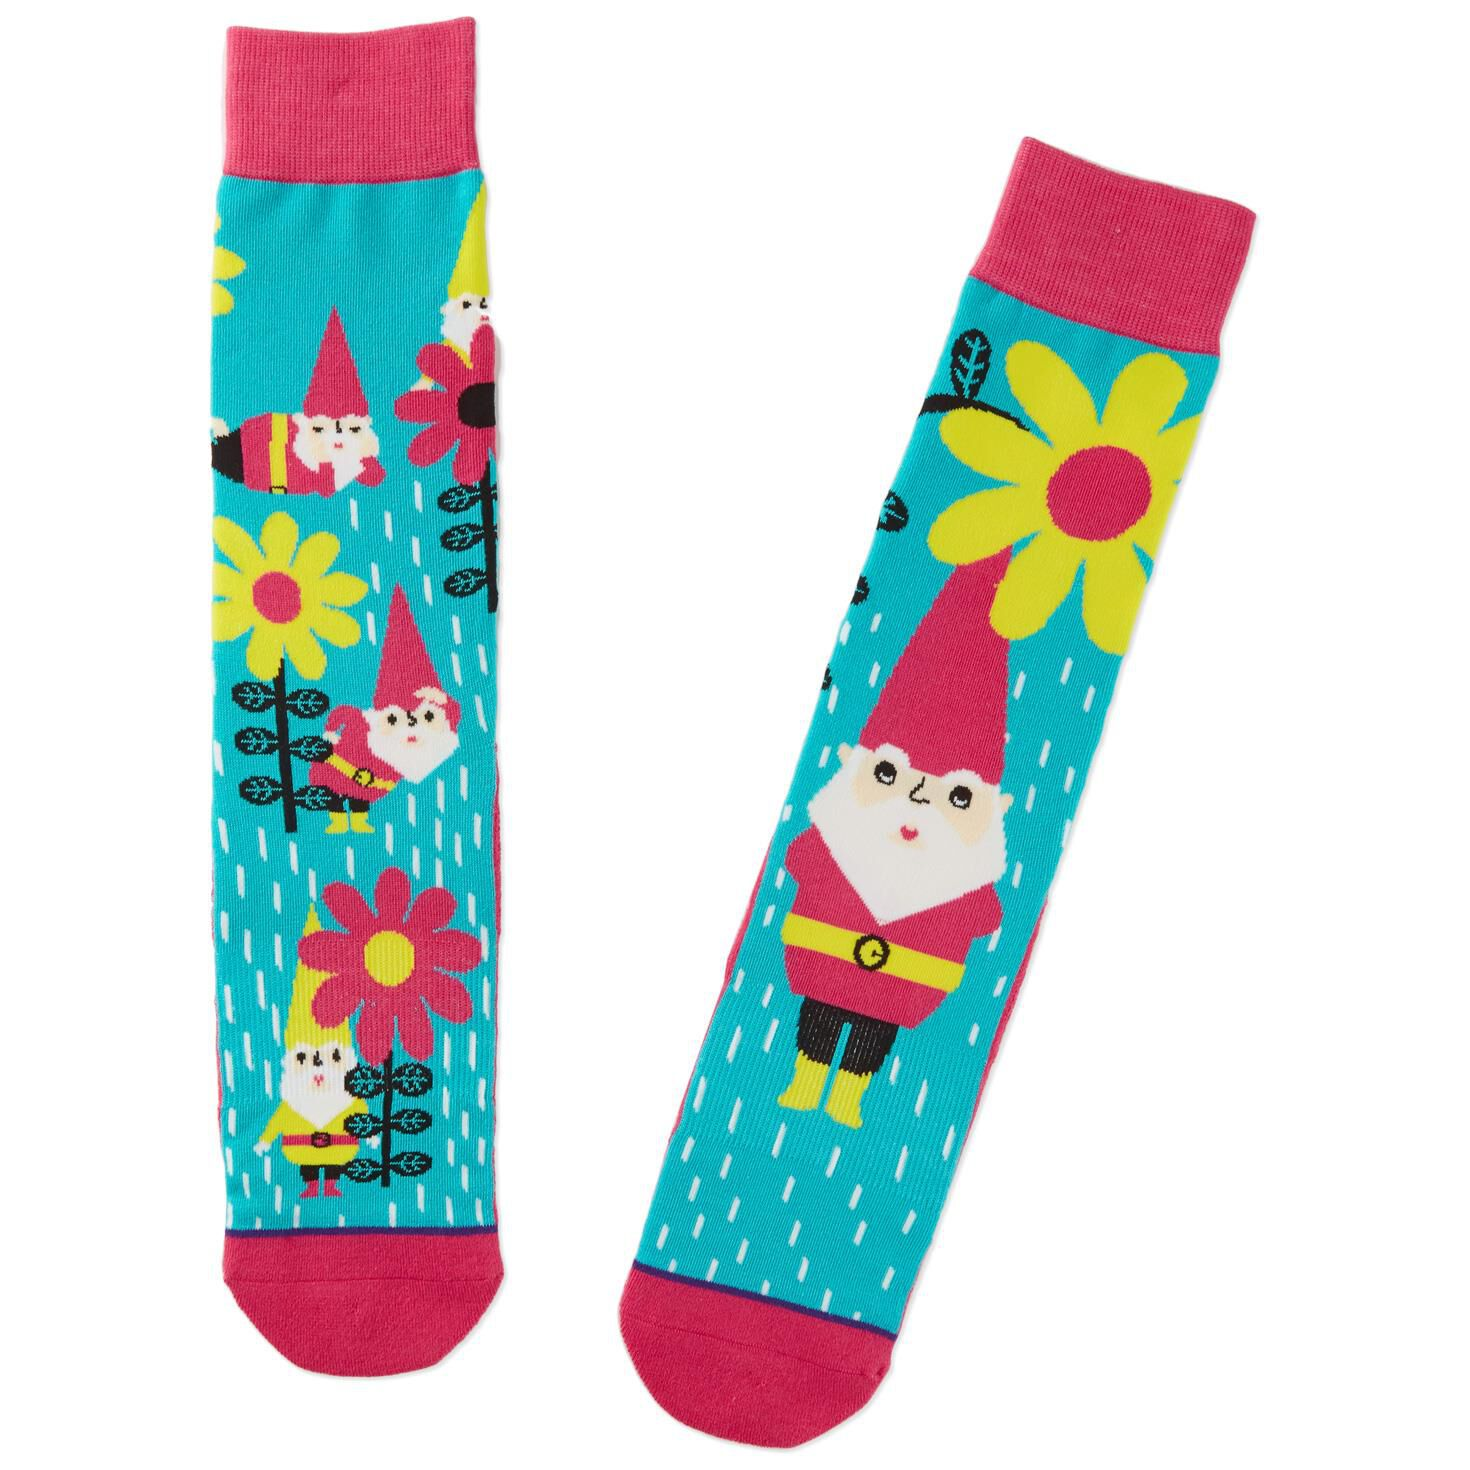 Garden Gnome Toe of a Kind Socks Socks Shoes Hallmark